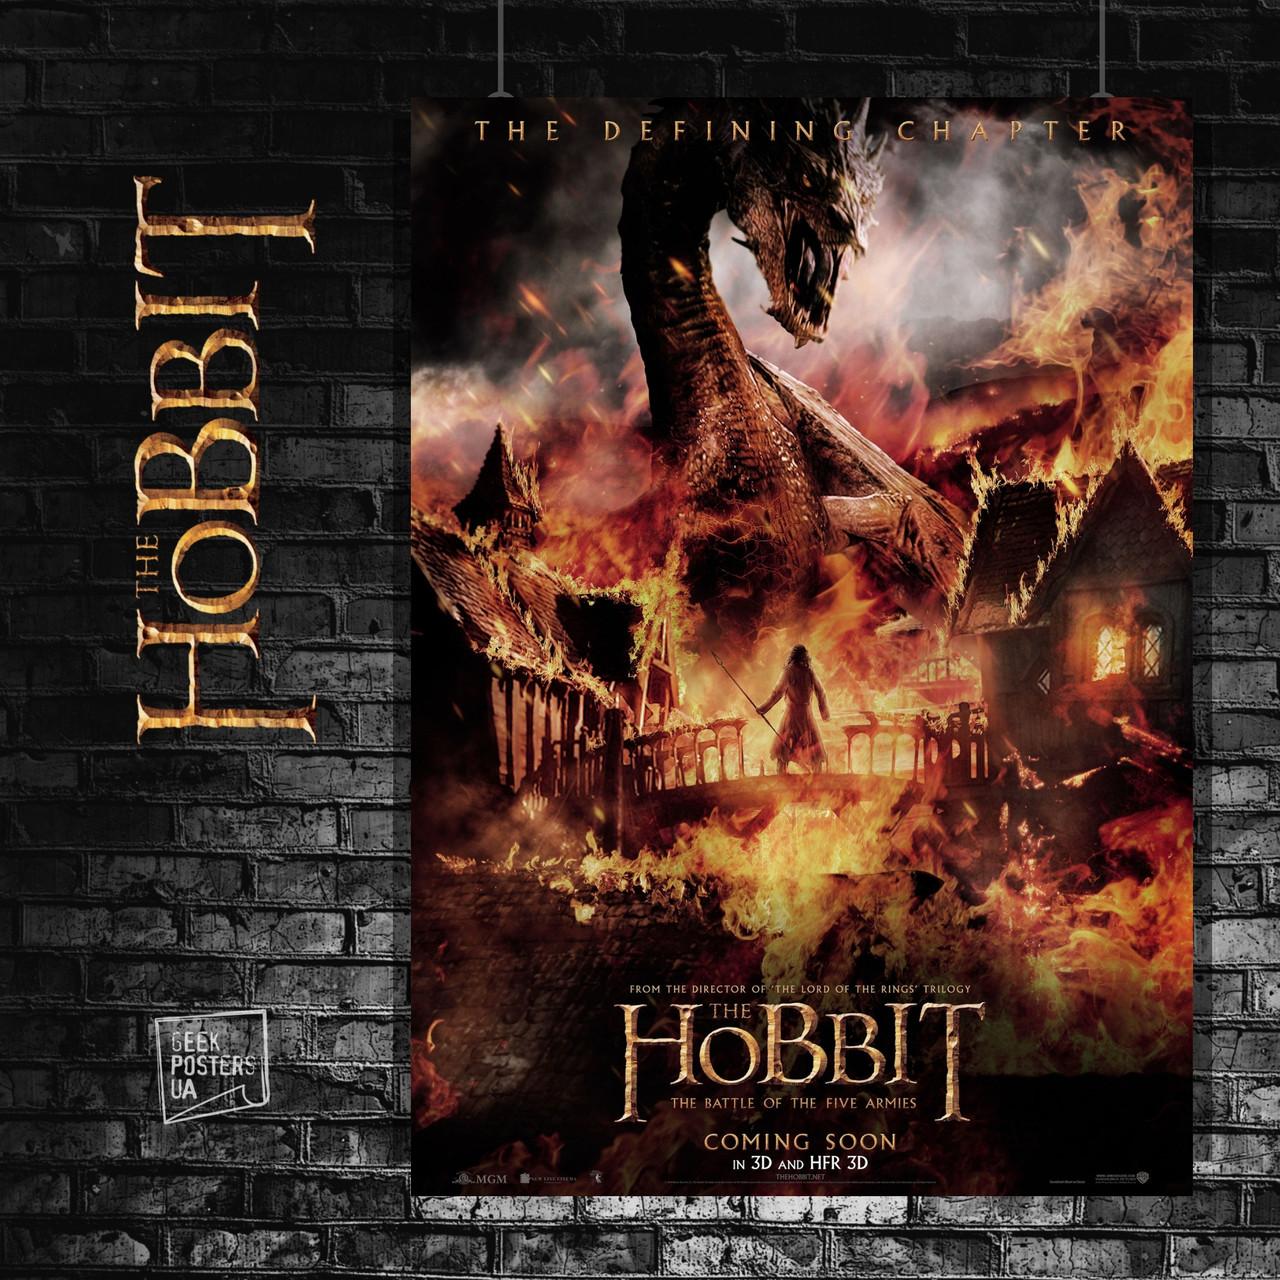 Постер Властелин Колец, Lord Of The Rings, Хоббит, Hobbit. Размер 60x42см (A2). Глянцевая бумага